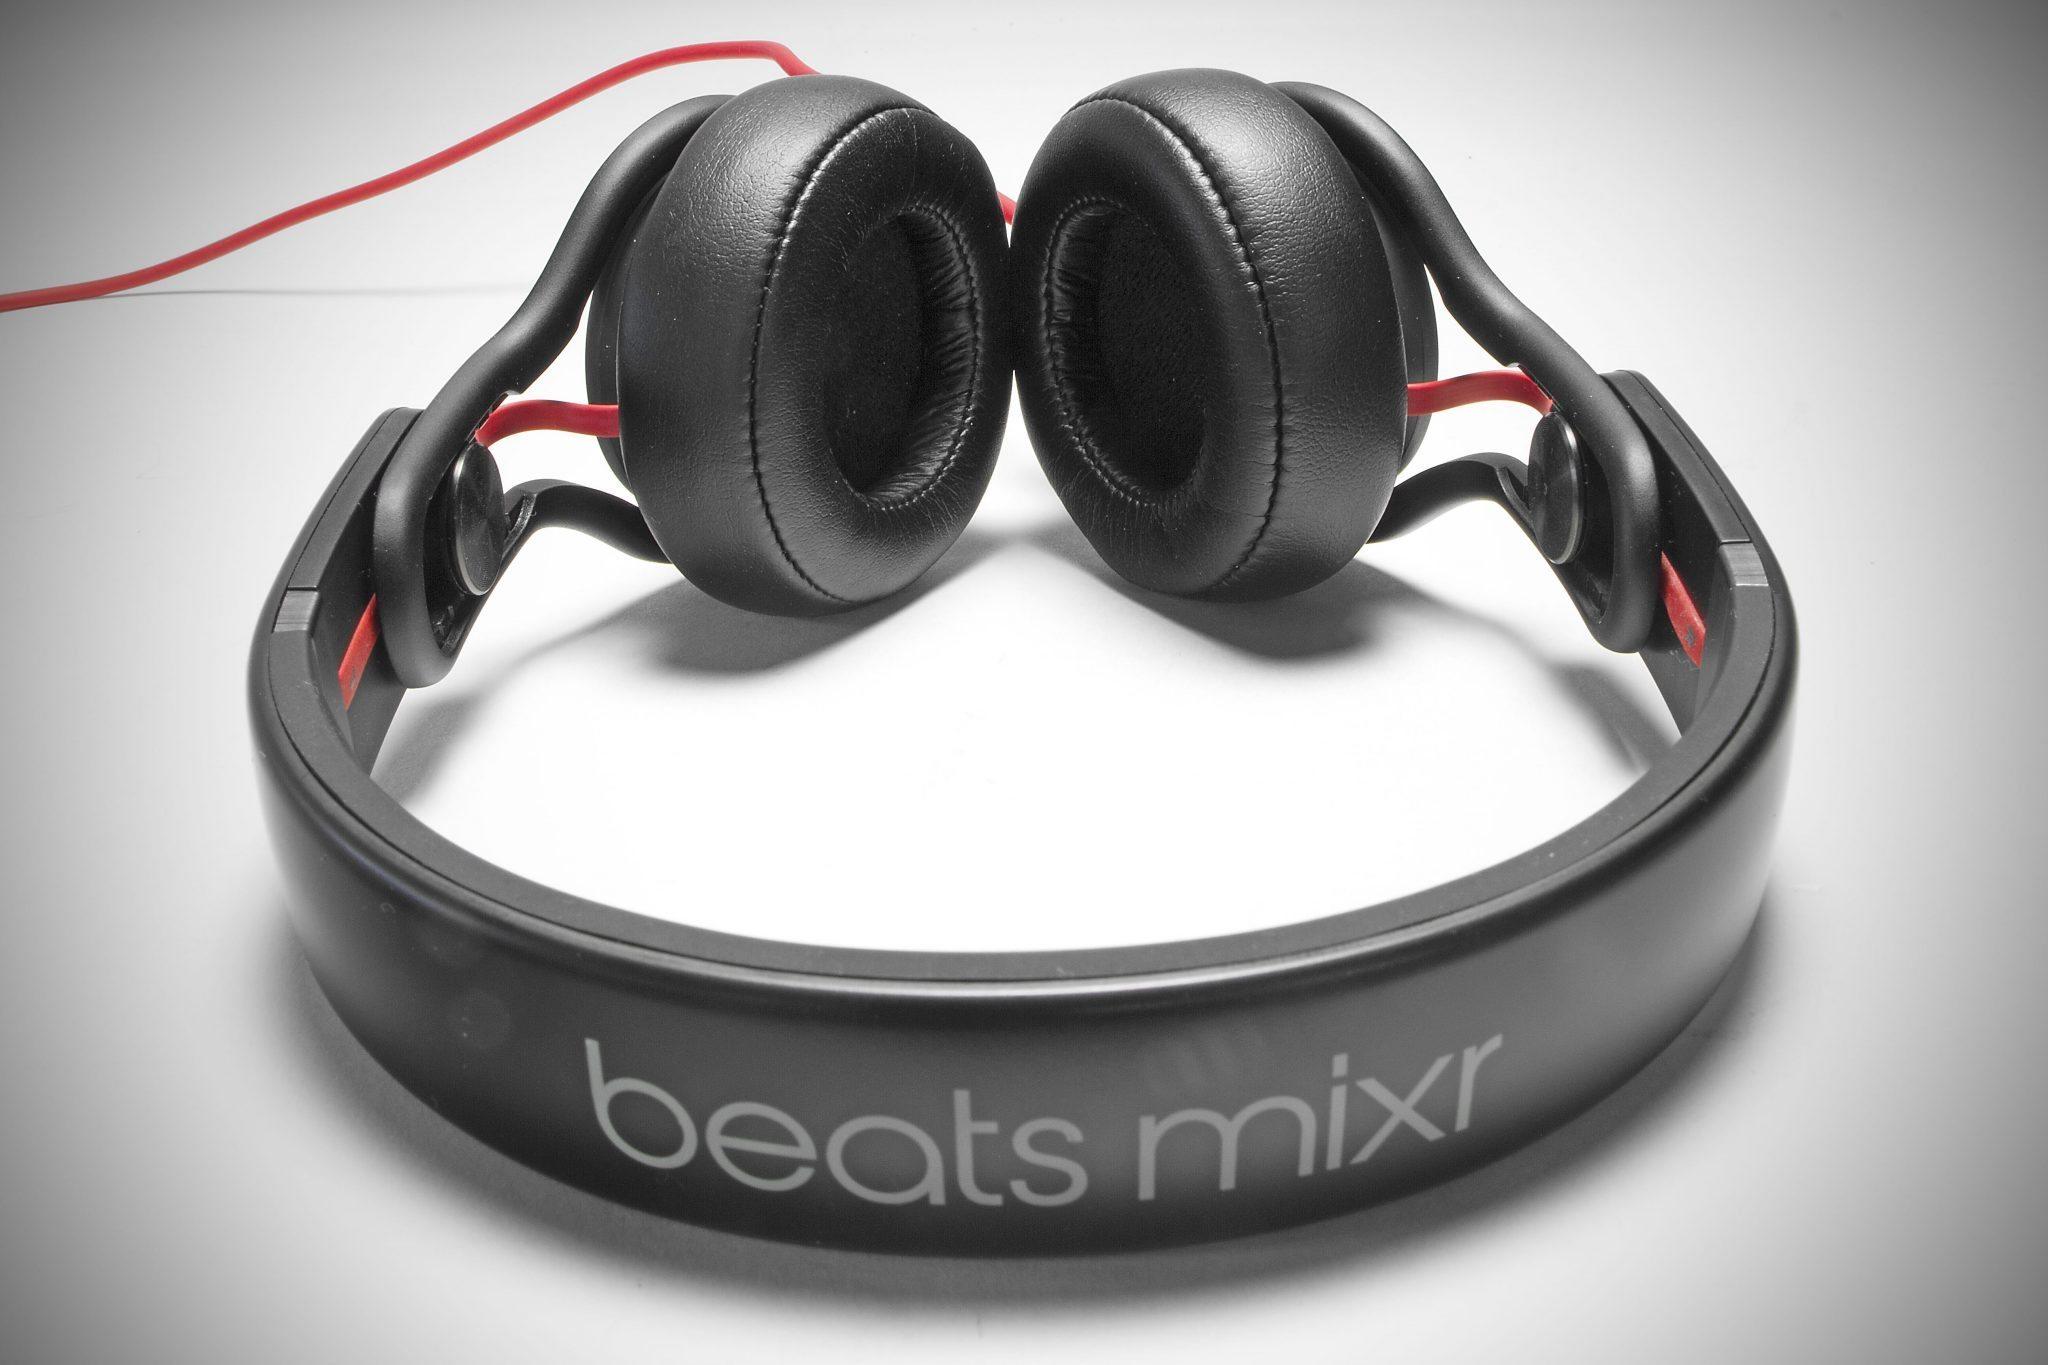 review beats by dre mixr dj headphones djworx. Black Bedroom Furniture Sets. Home Design Ideas